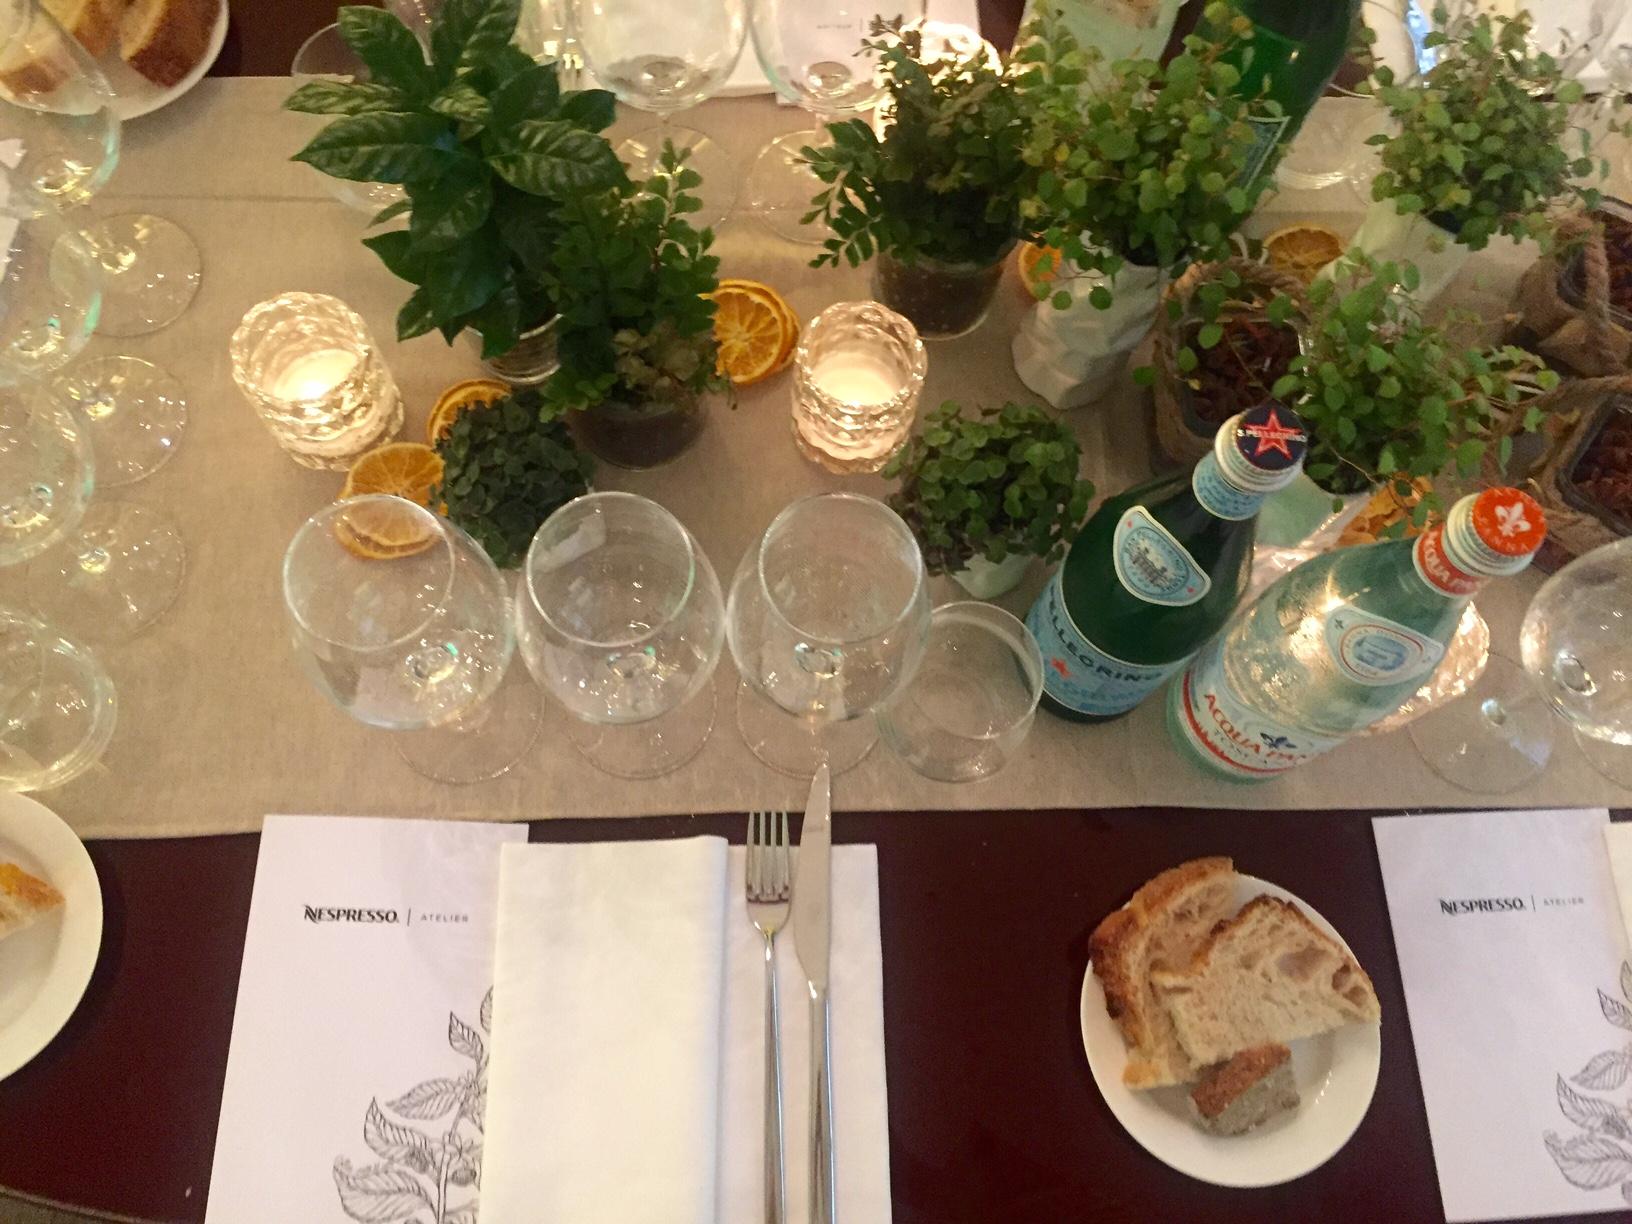 tavola-atelier-nespresso-menu-stellato-caffe